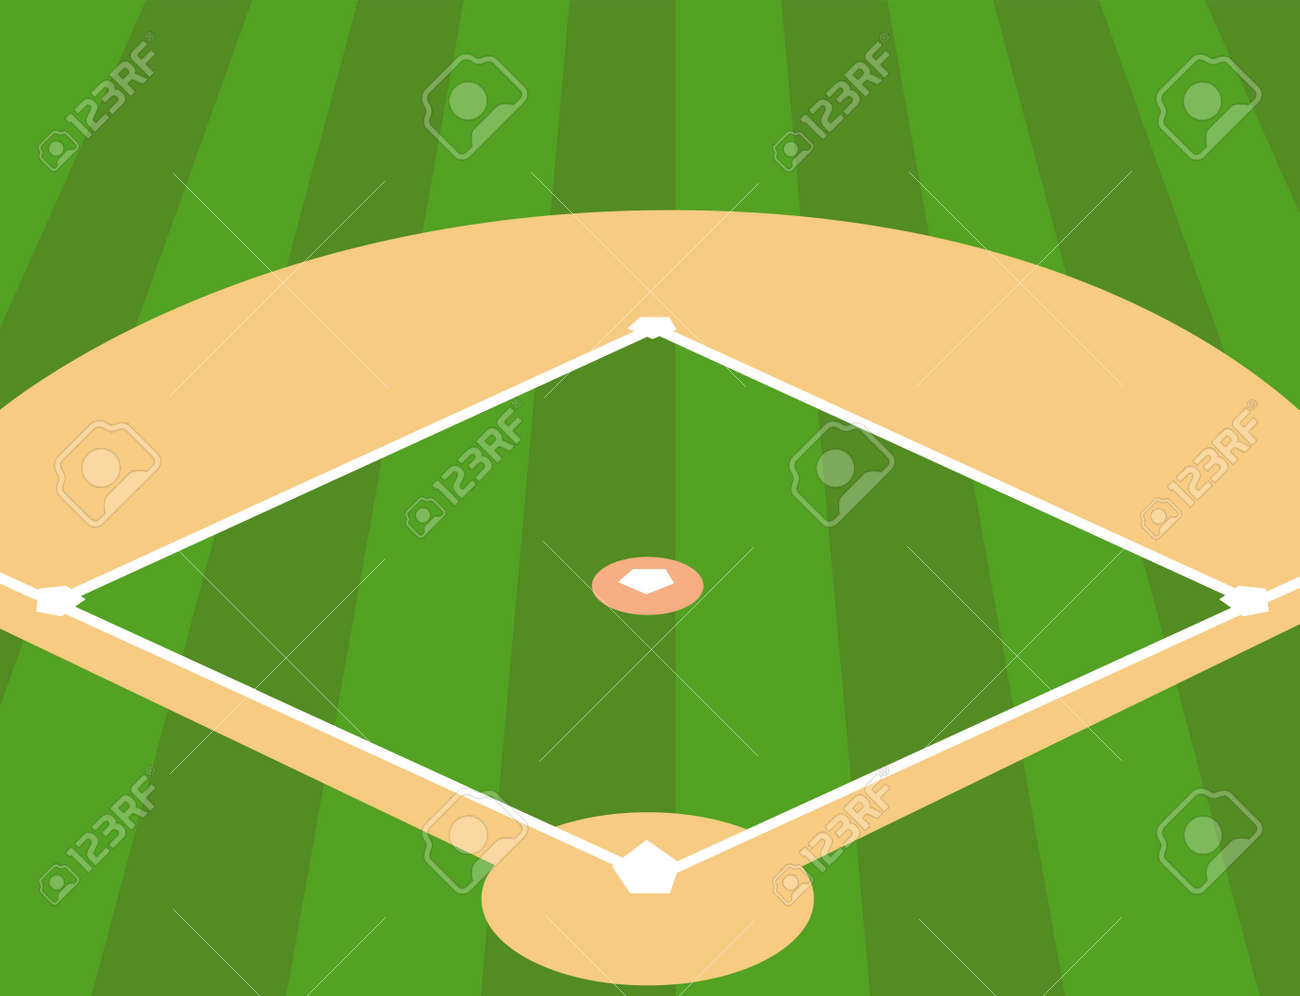 vector illustration of baseball field as background royalty free rh 123rf com Baseball Bat Vector baseball field vector image